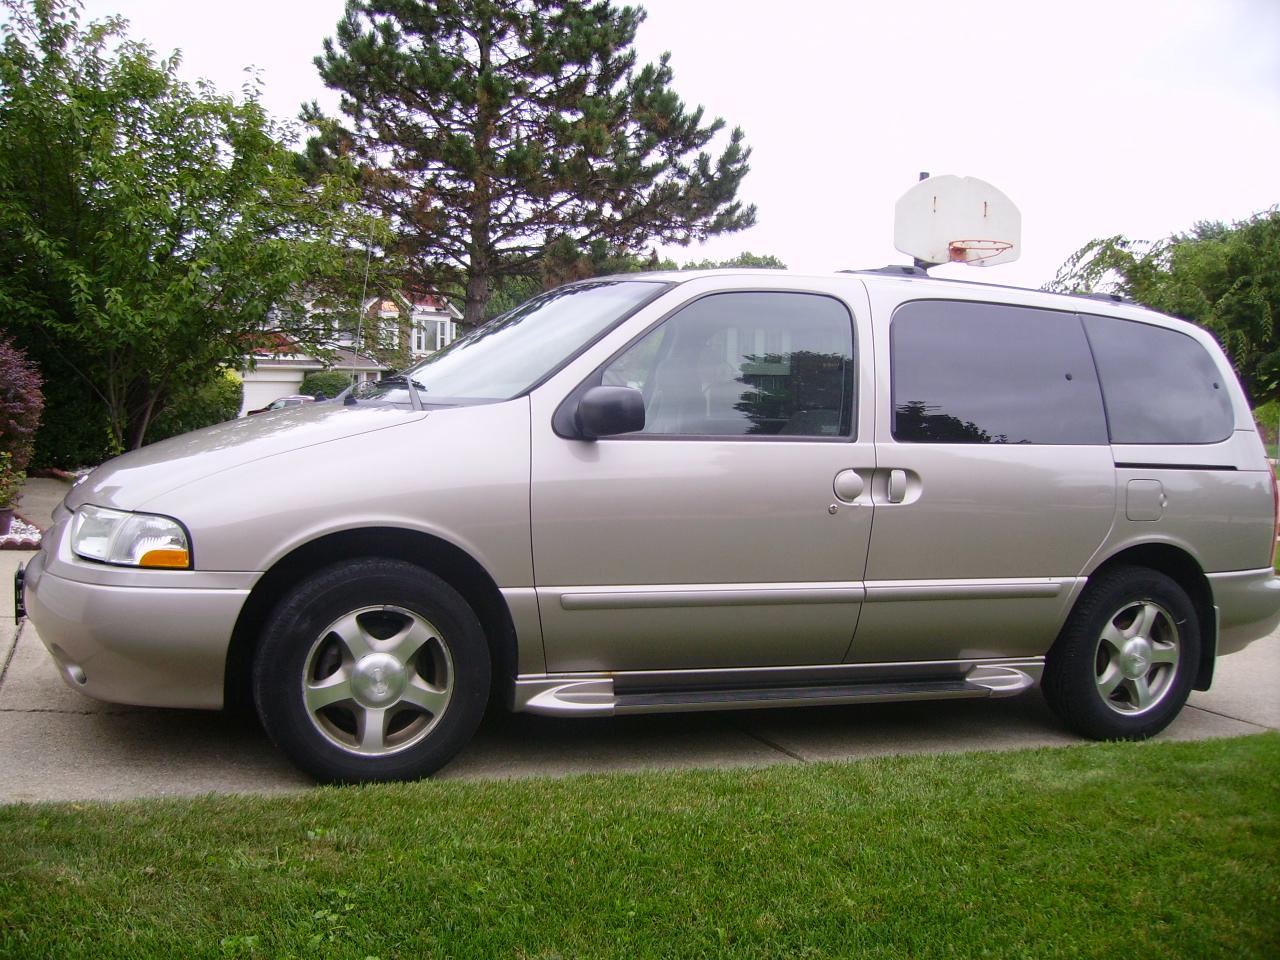 2001 Nissan Quest Pictures Cargurus